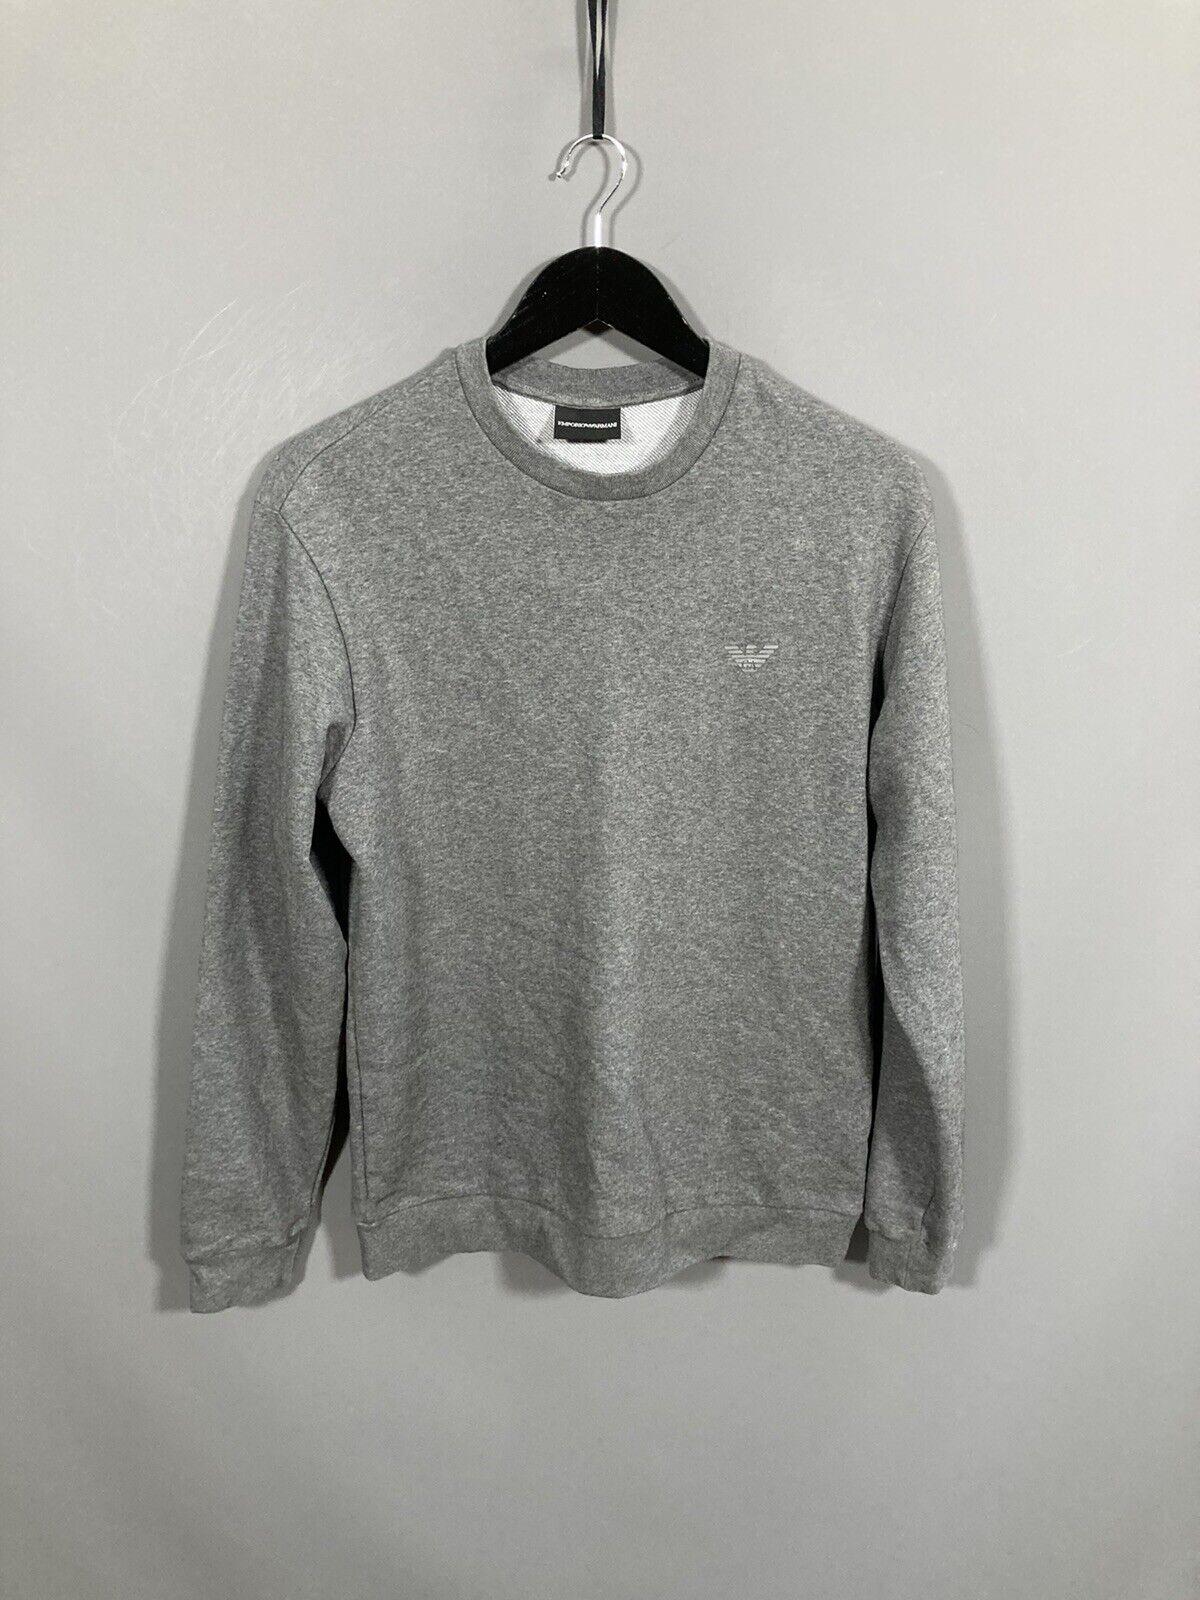 ARMANI Sweatshirt - Size Large - Grey - Great Condition - Men's